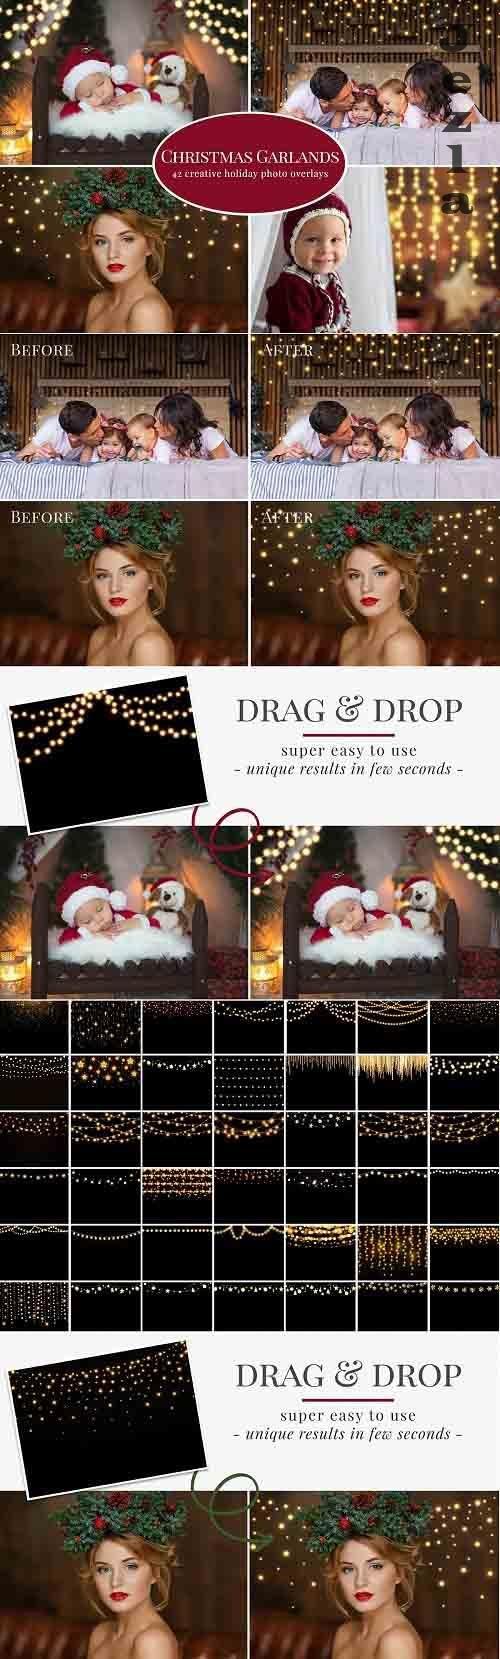 CreativeMarket - Christmas Garlands photo overlays 5608034